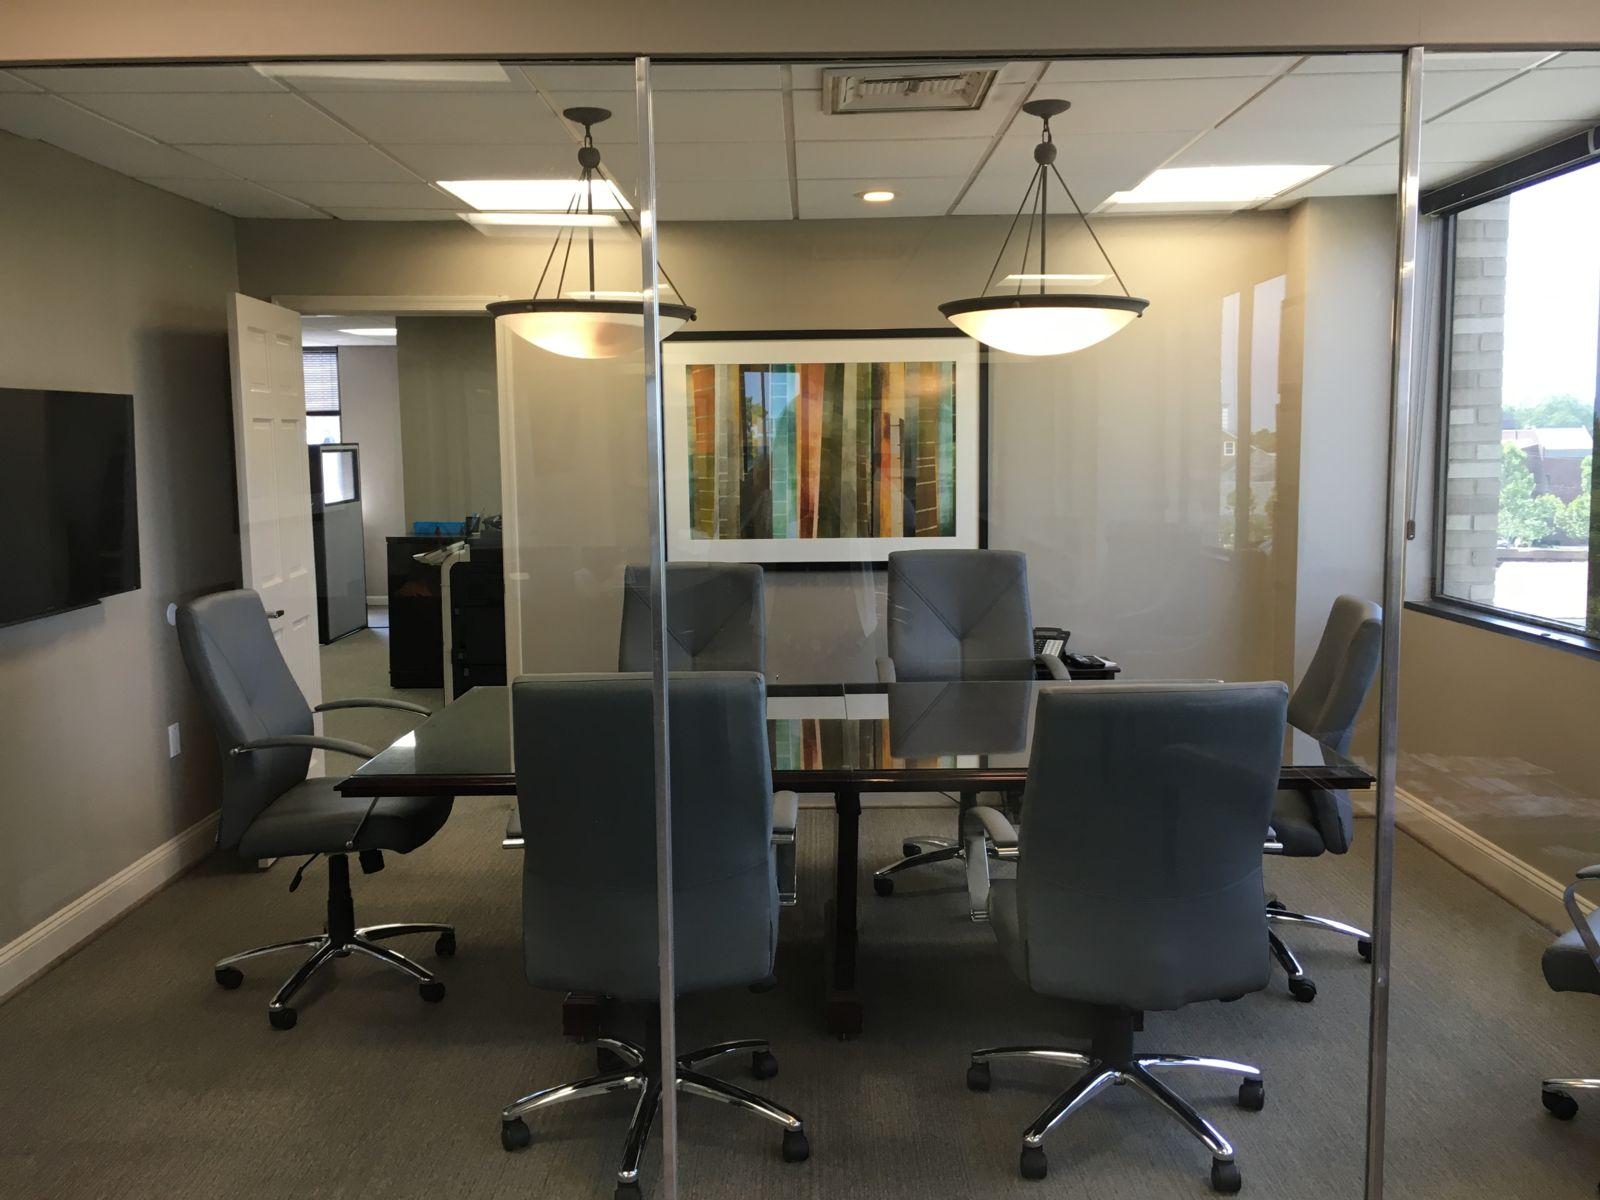 KFFJ Conference Room